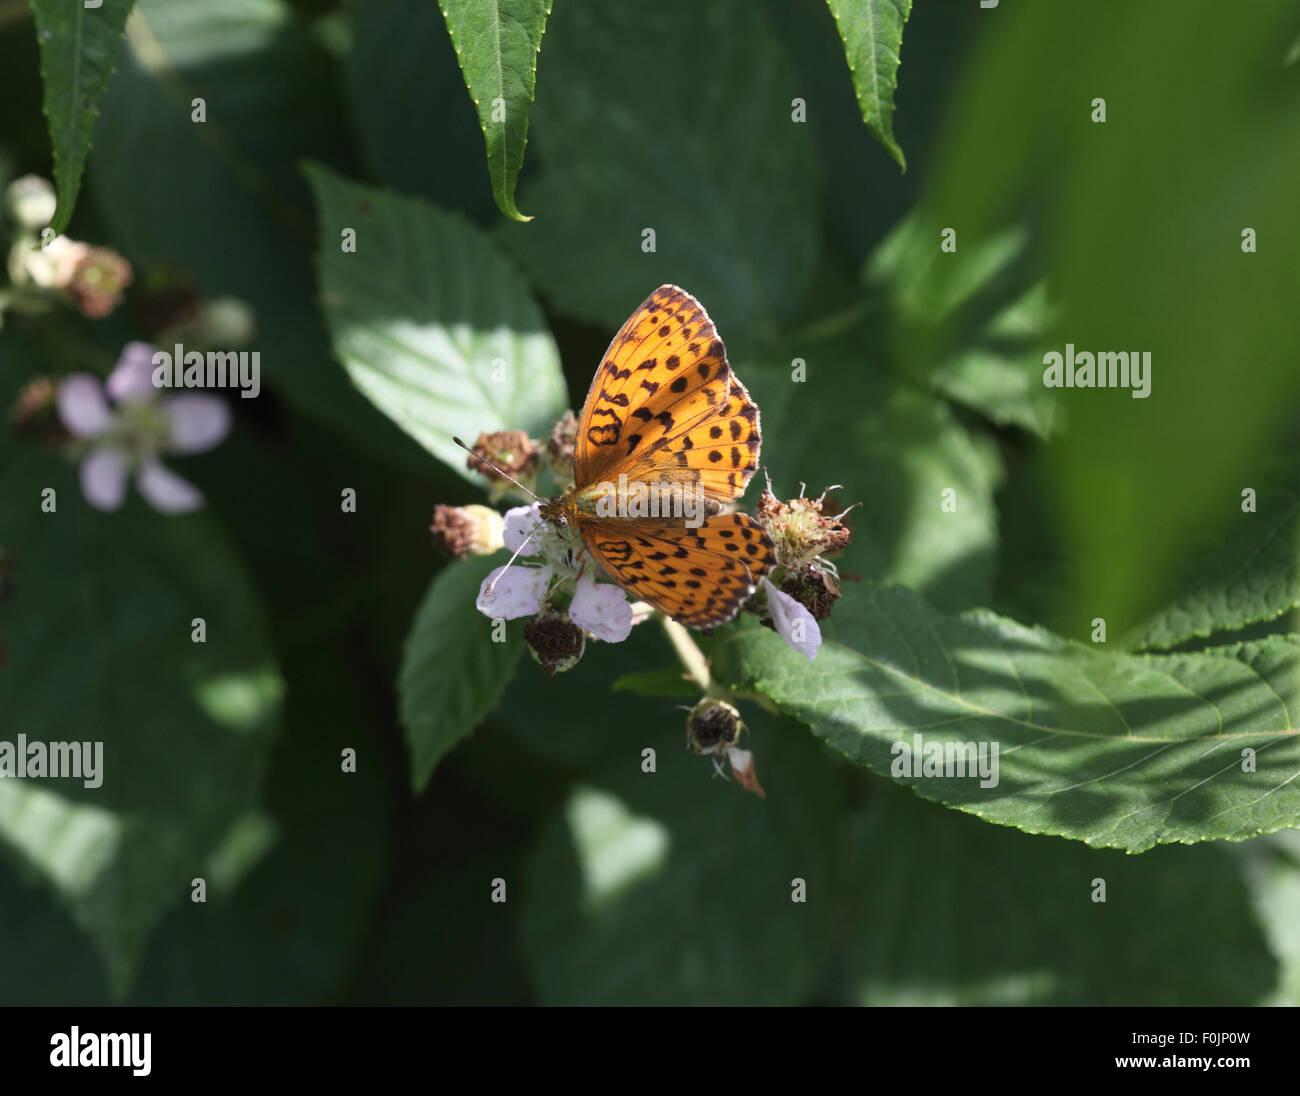 Marbled fritillary Brenthis daphne taking nectar from bramble flower - Stock Image